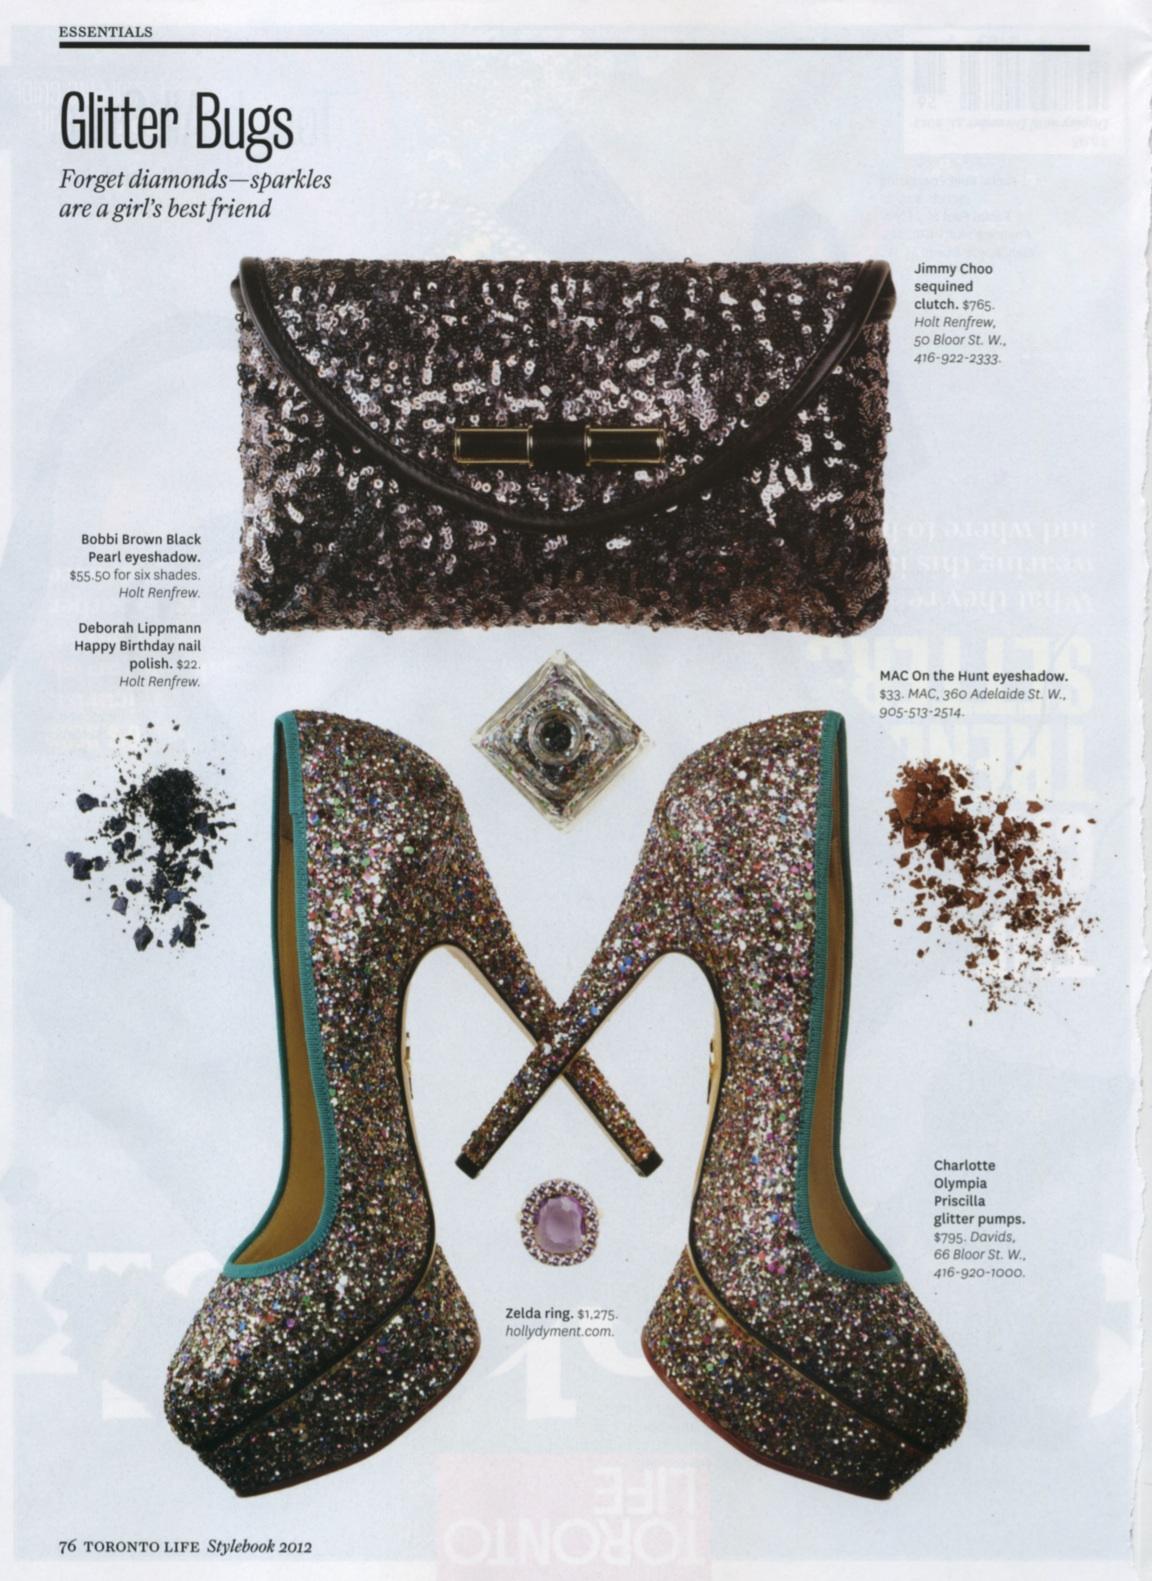 Zelda Ring.   Sliced Amethyst, Pink sapphires, set in 14K yellow gold.